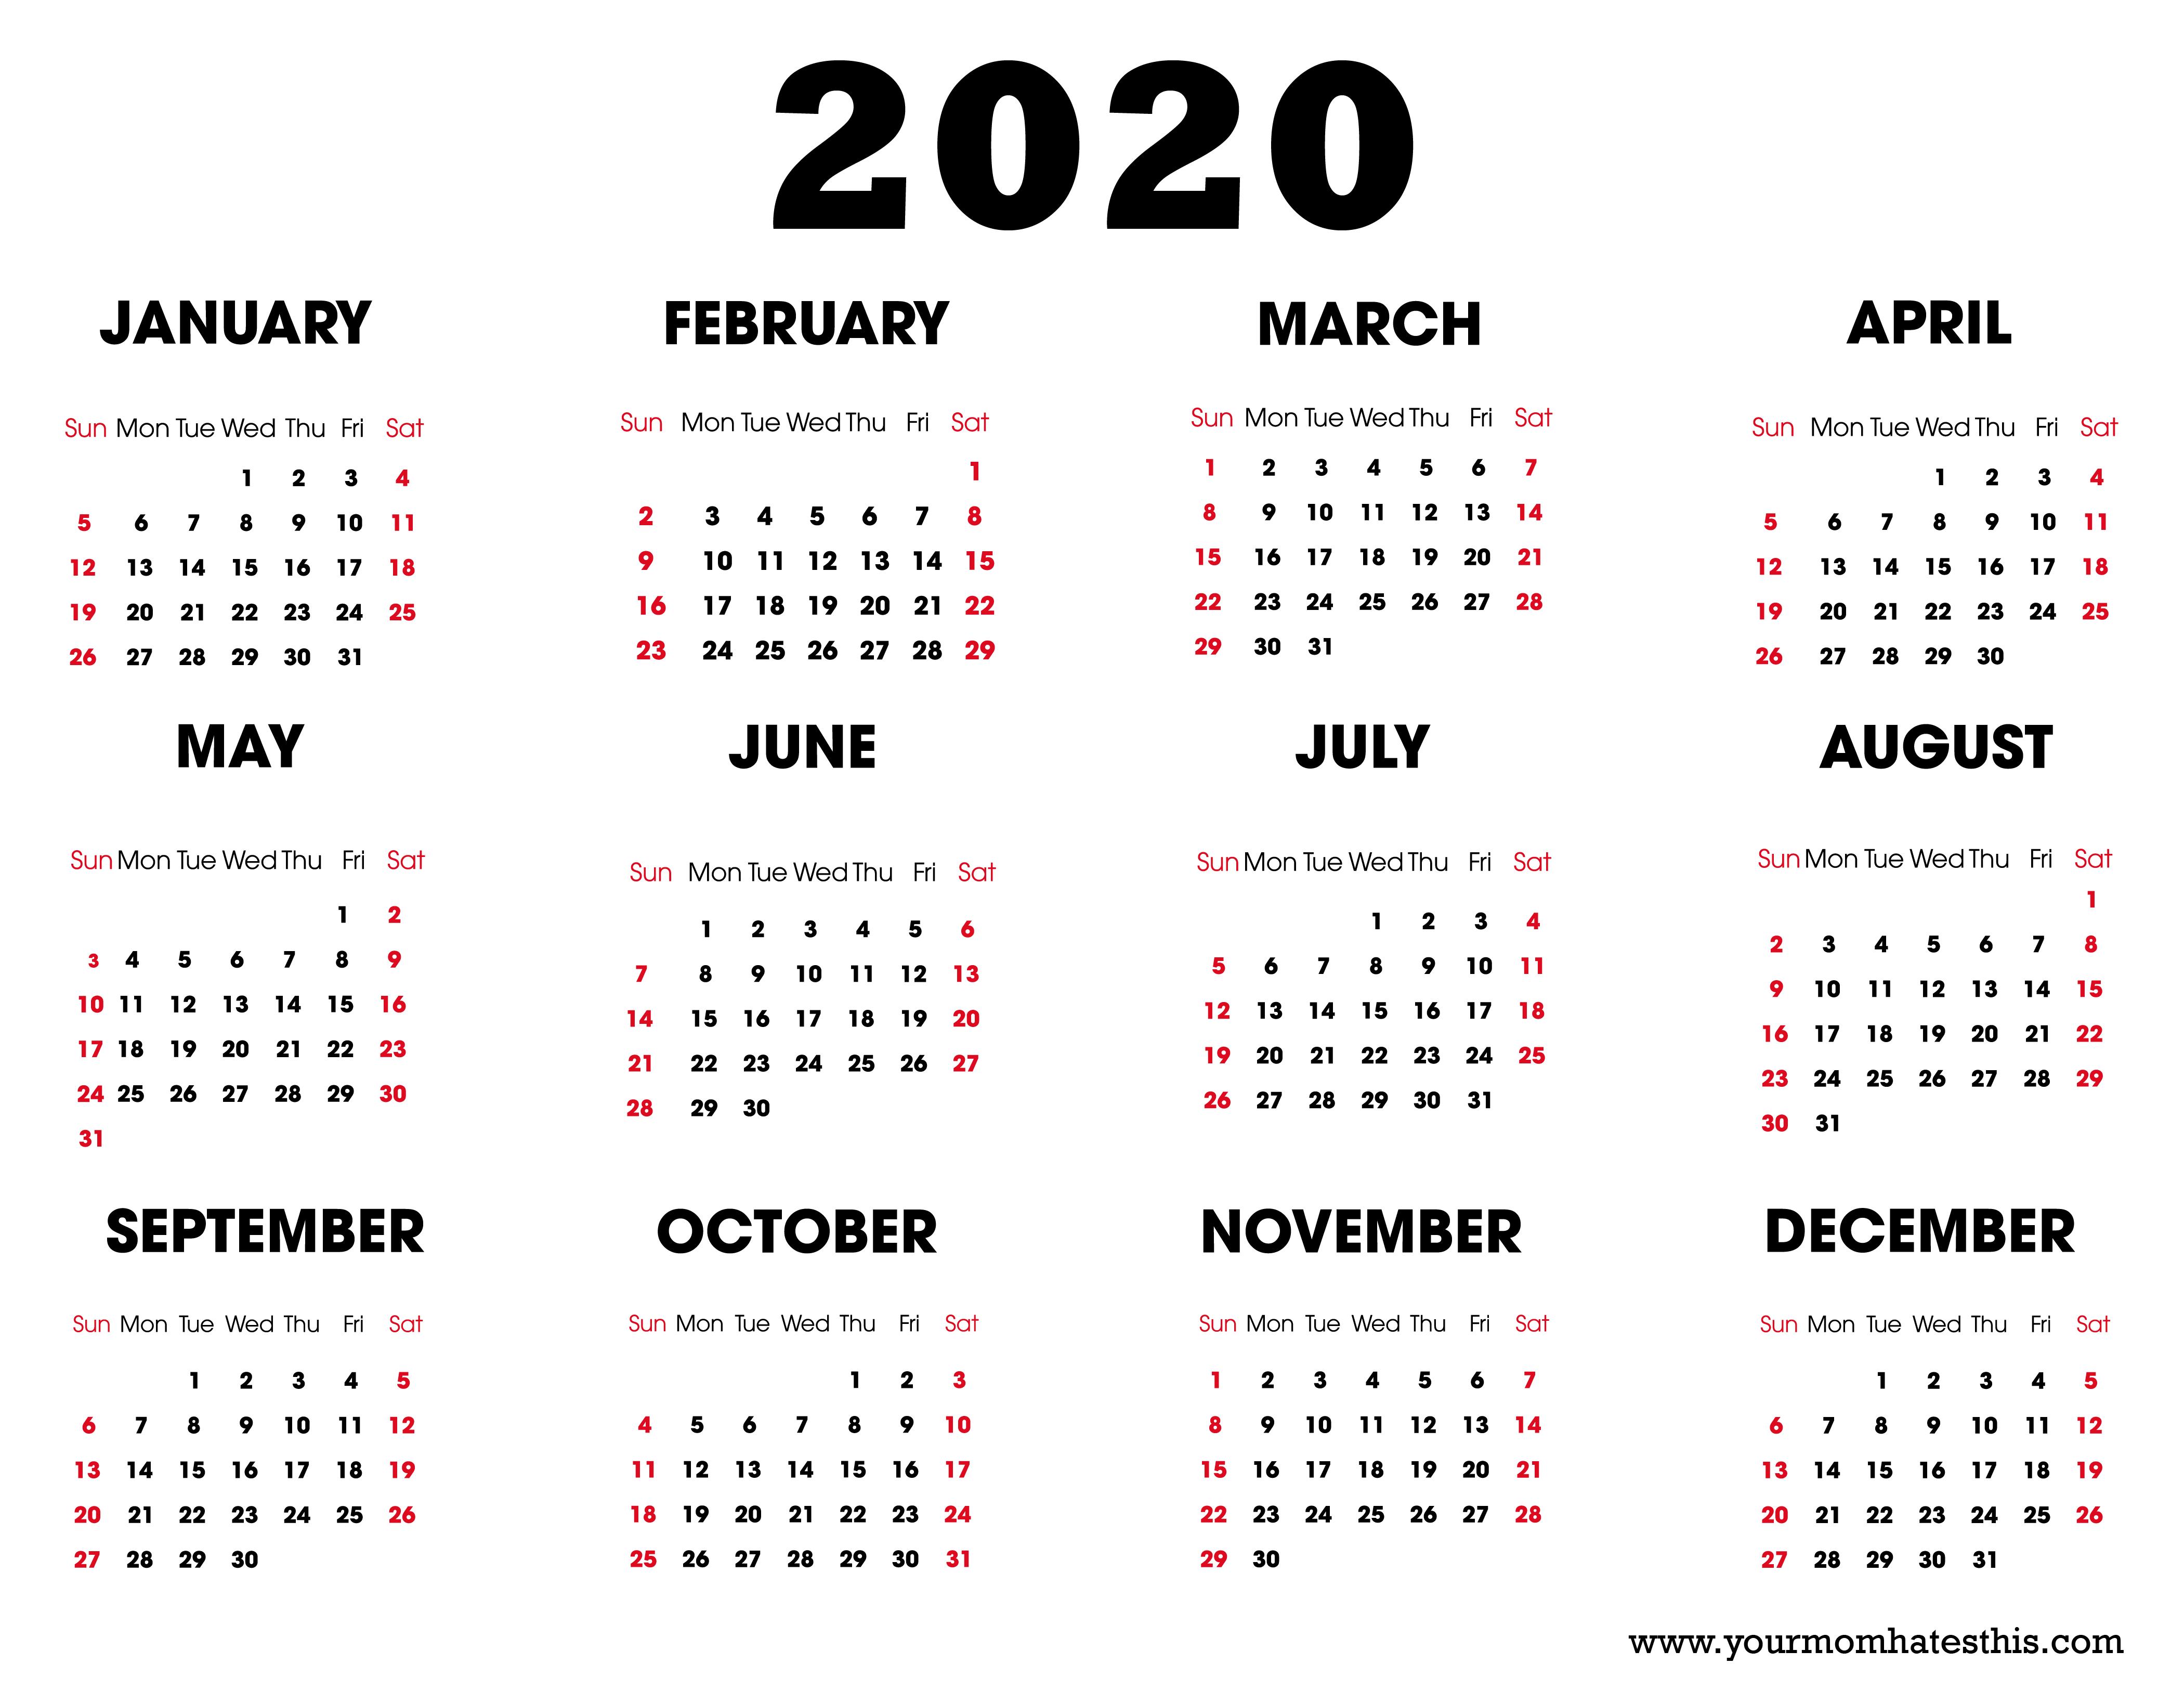 Free 2020 2020 Calendar - Wpa.wpart.co in 2020 Calendar Free